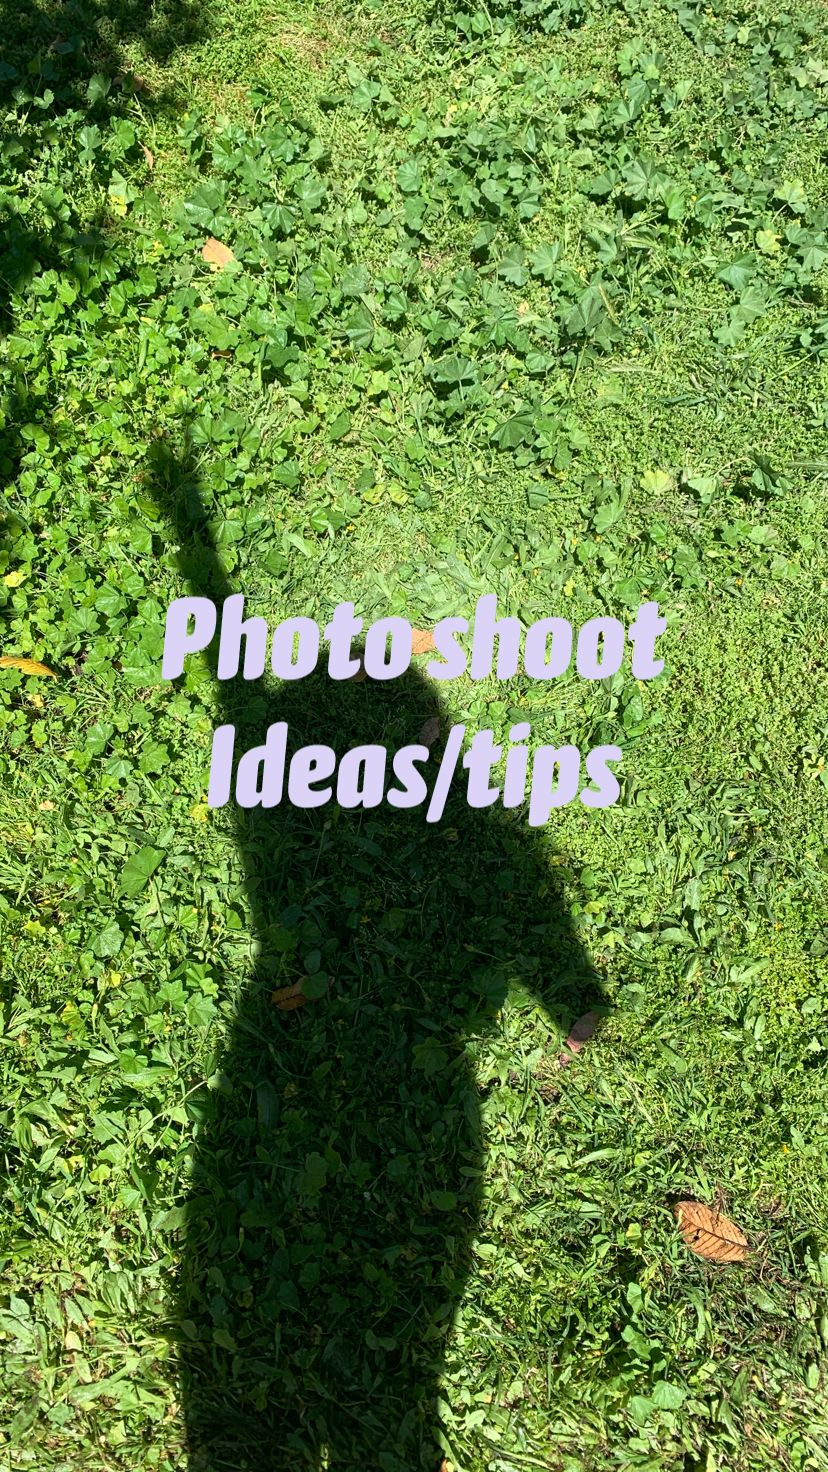 Photo shoot  Ideas/tips